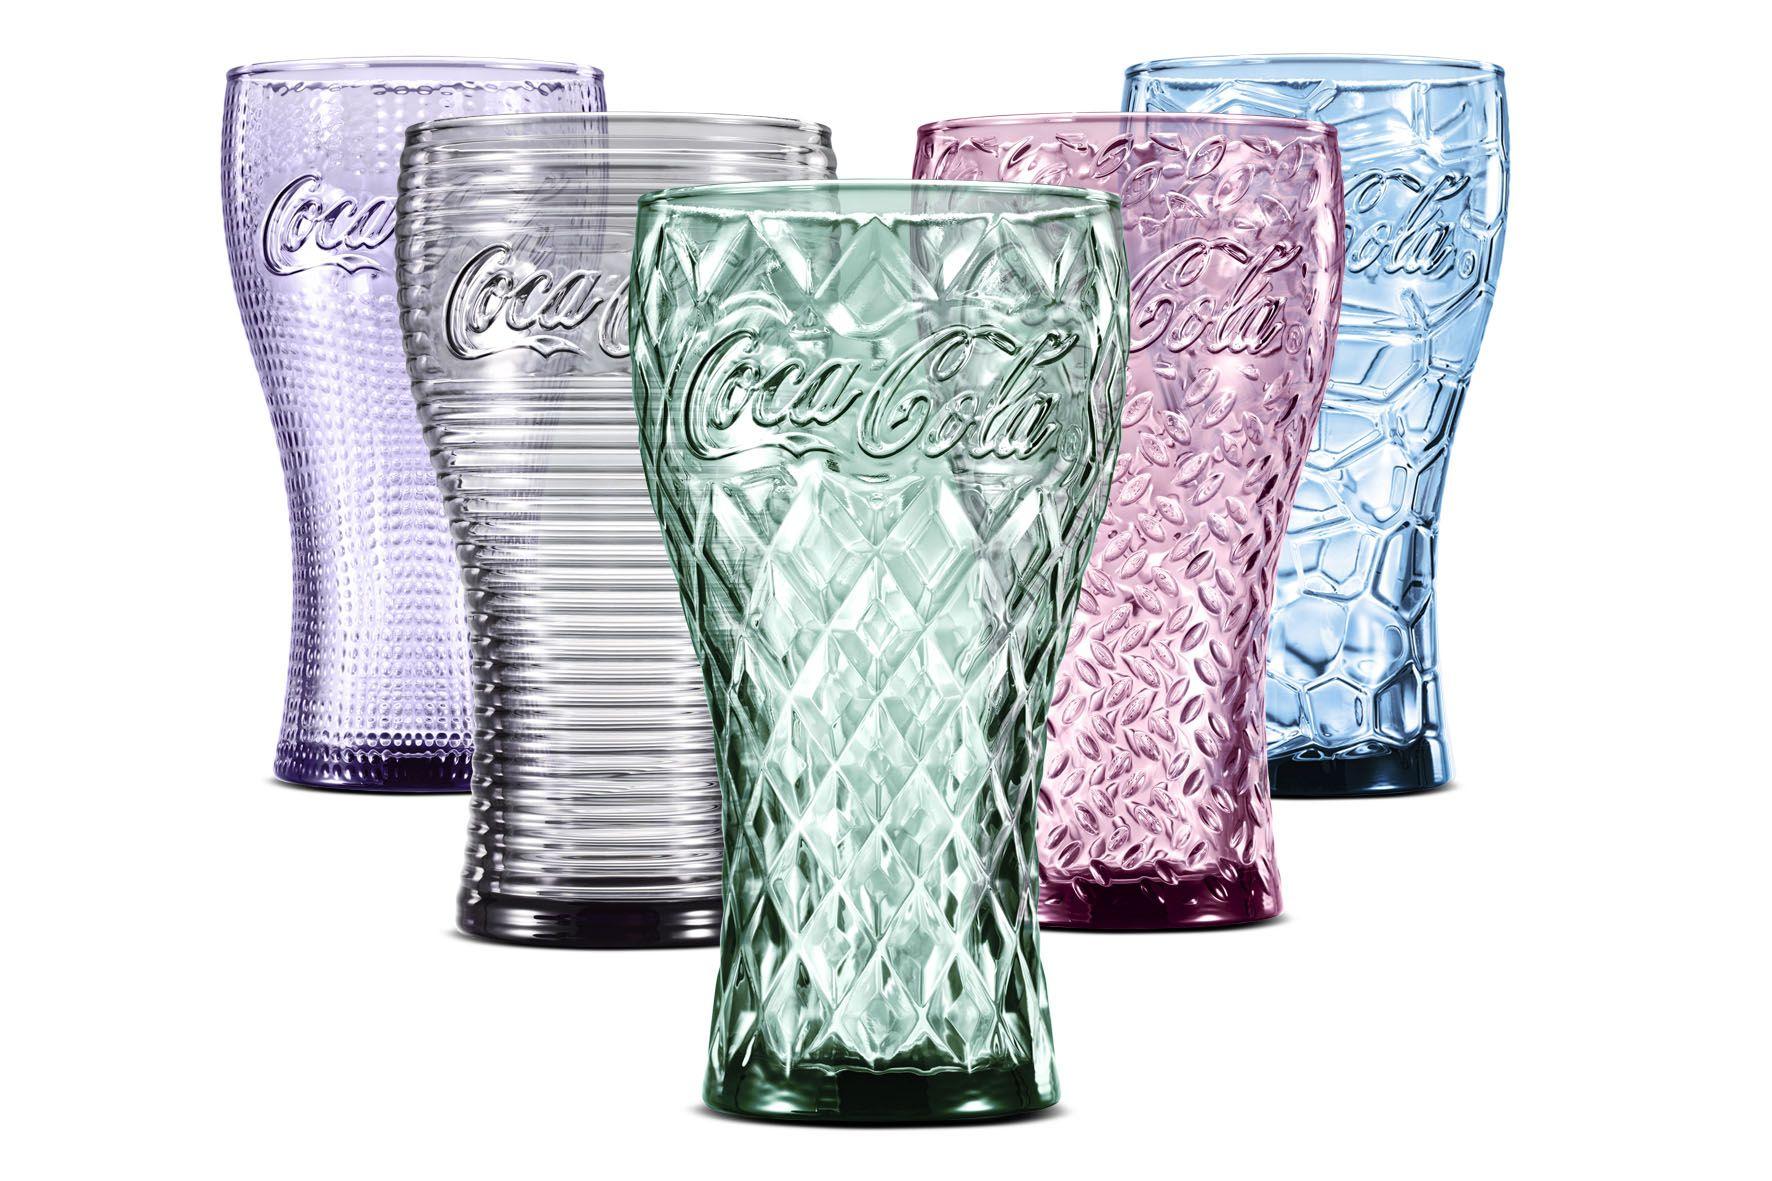 McDonald's Coca Cola Glas gratis, 2. Chance